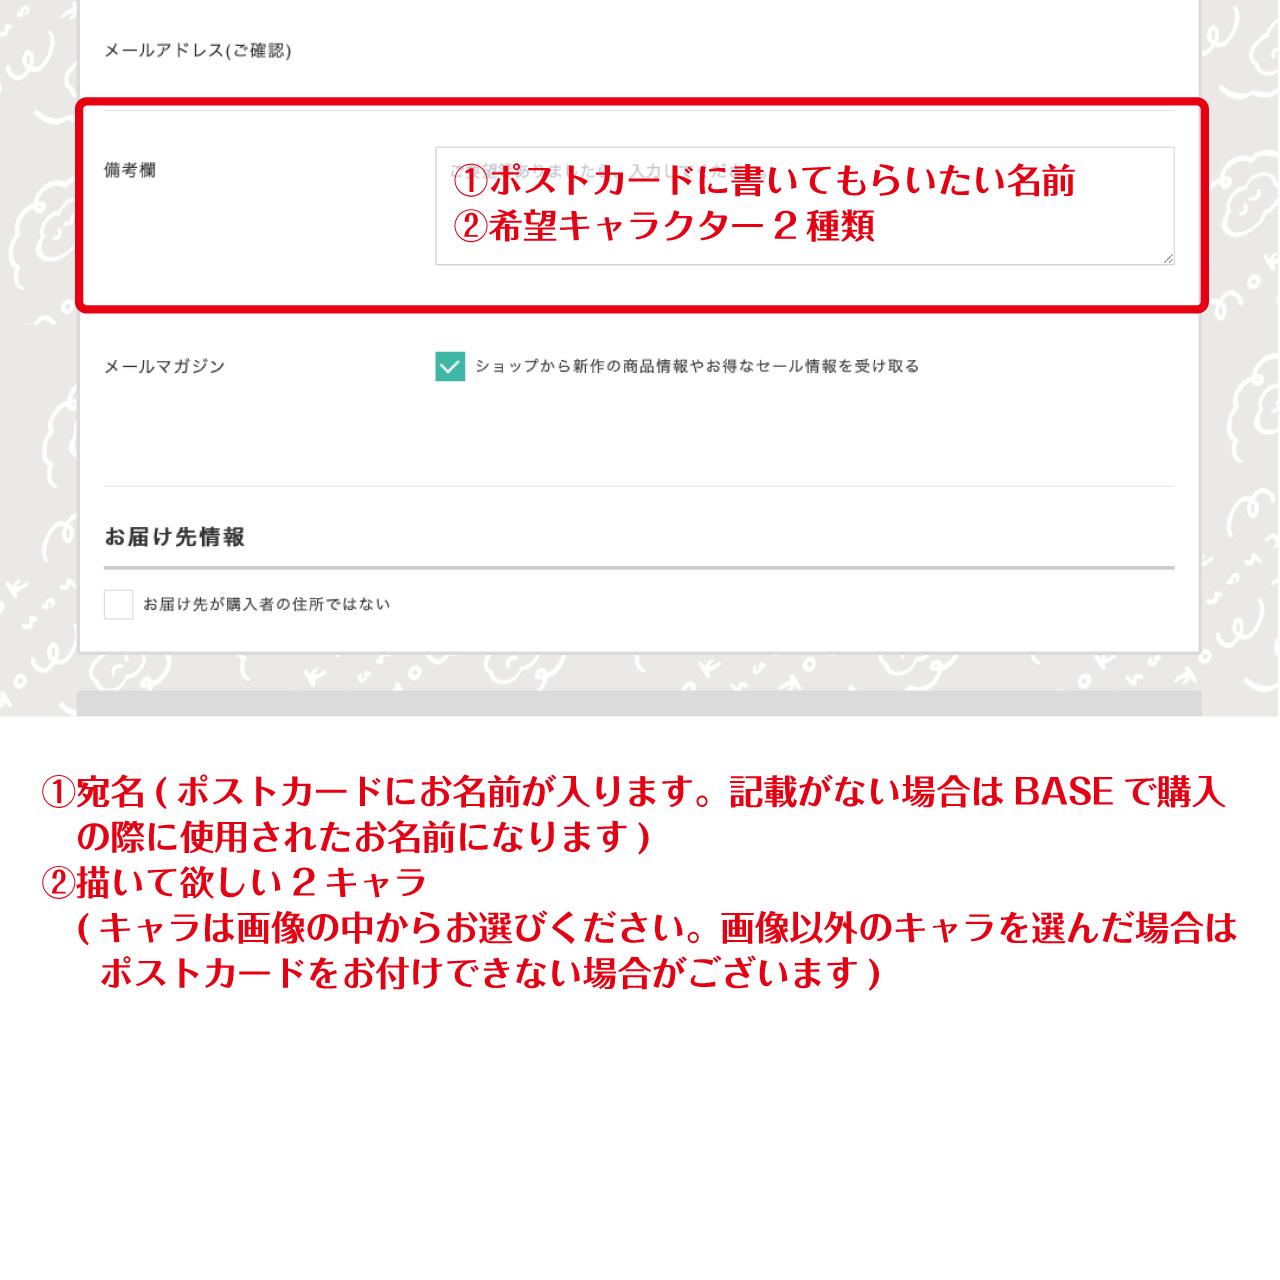 WEBサイン会 緊急大決定!!!